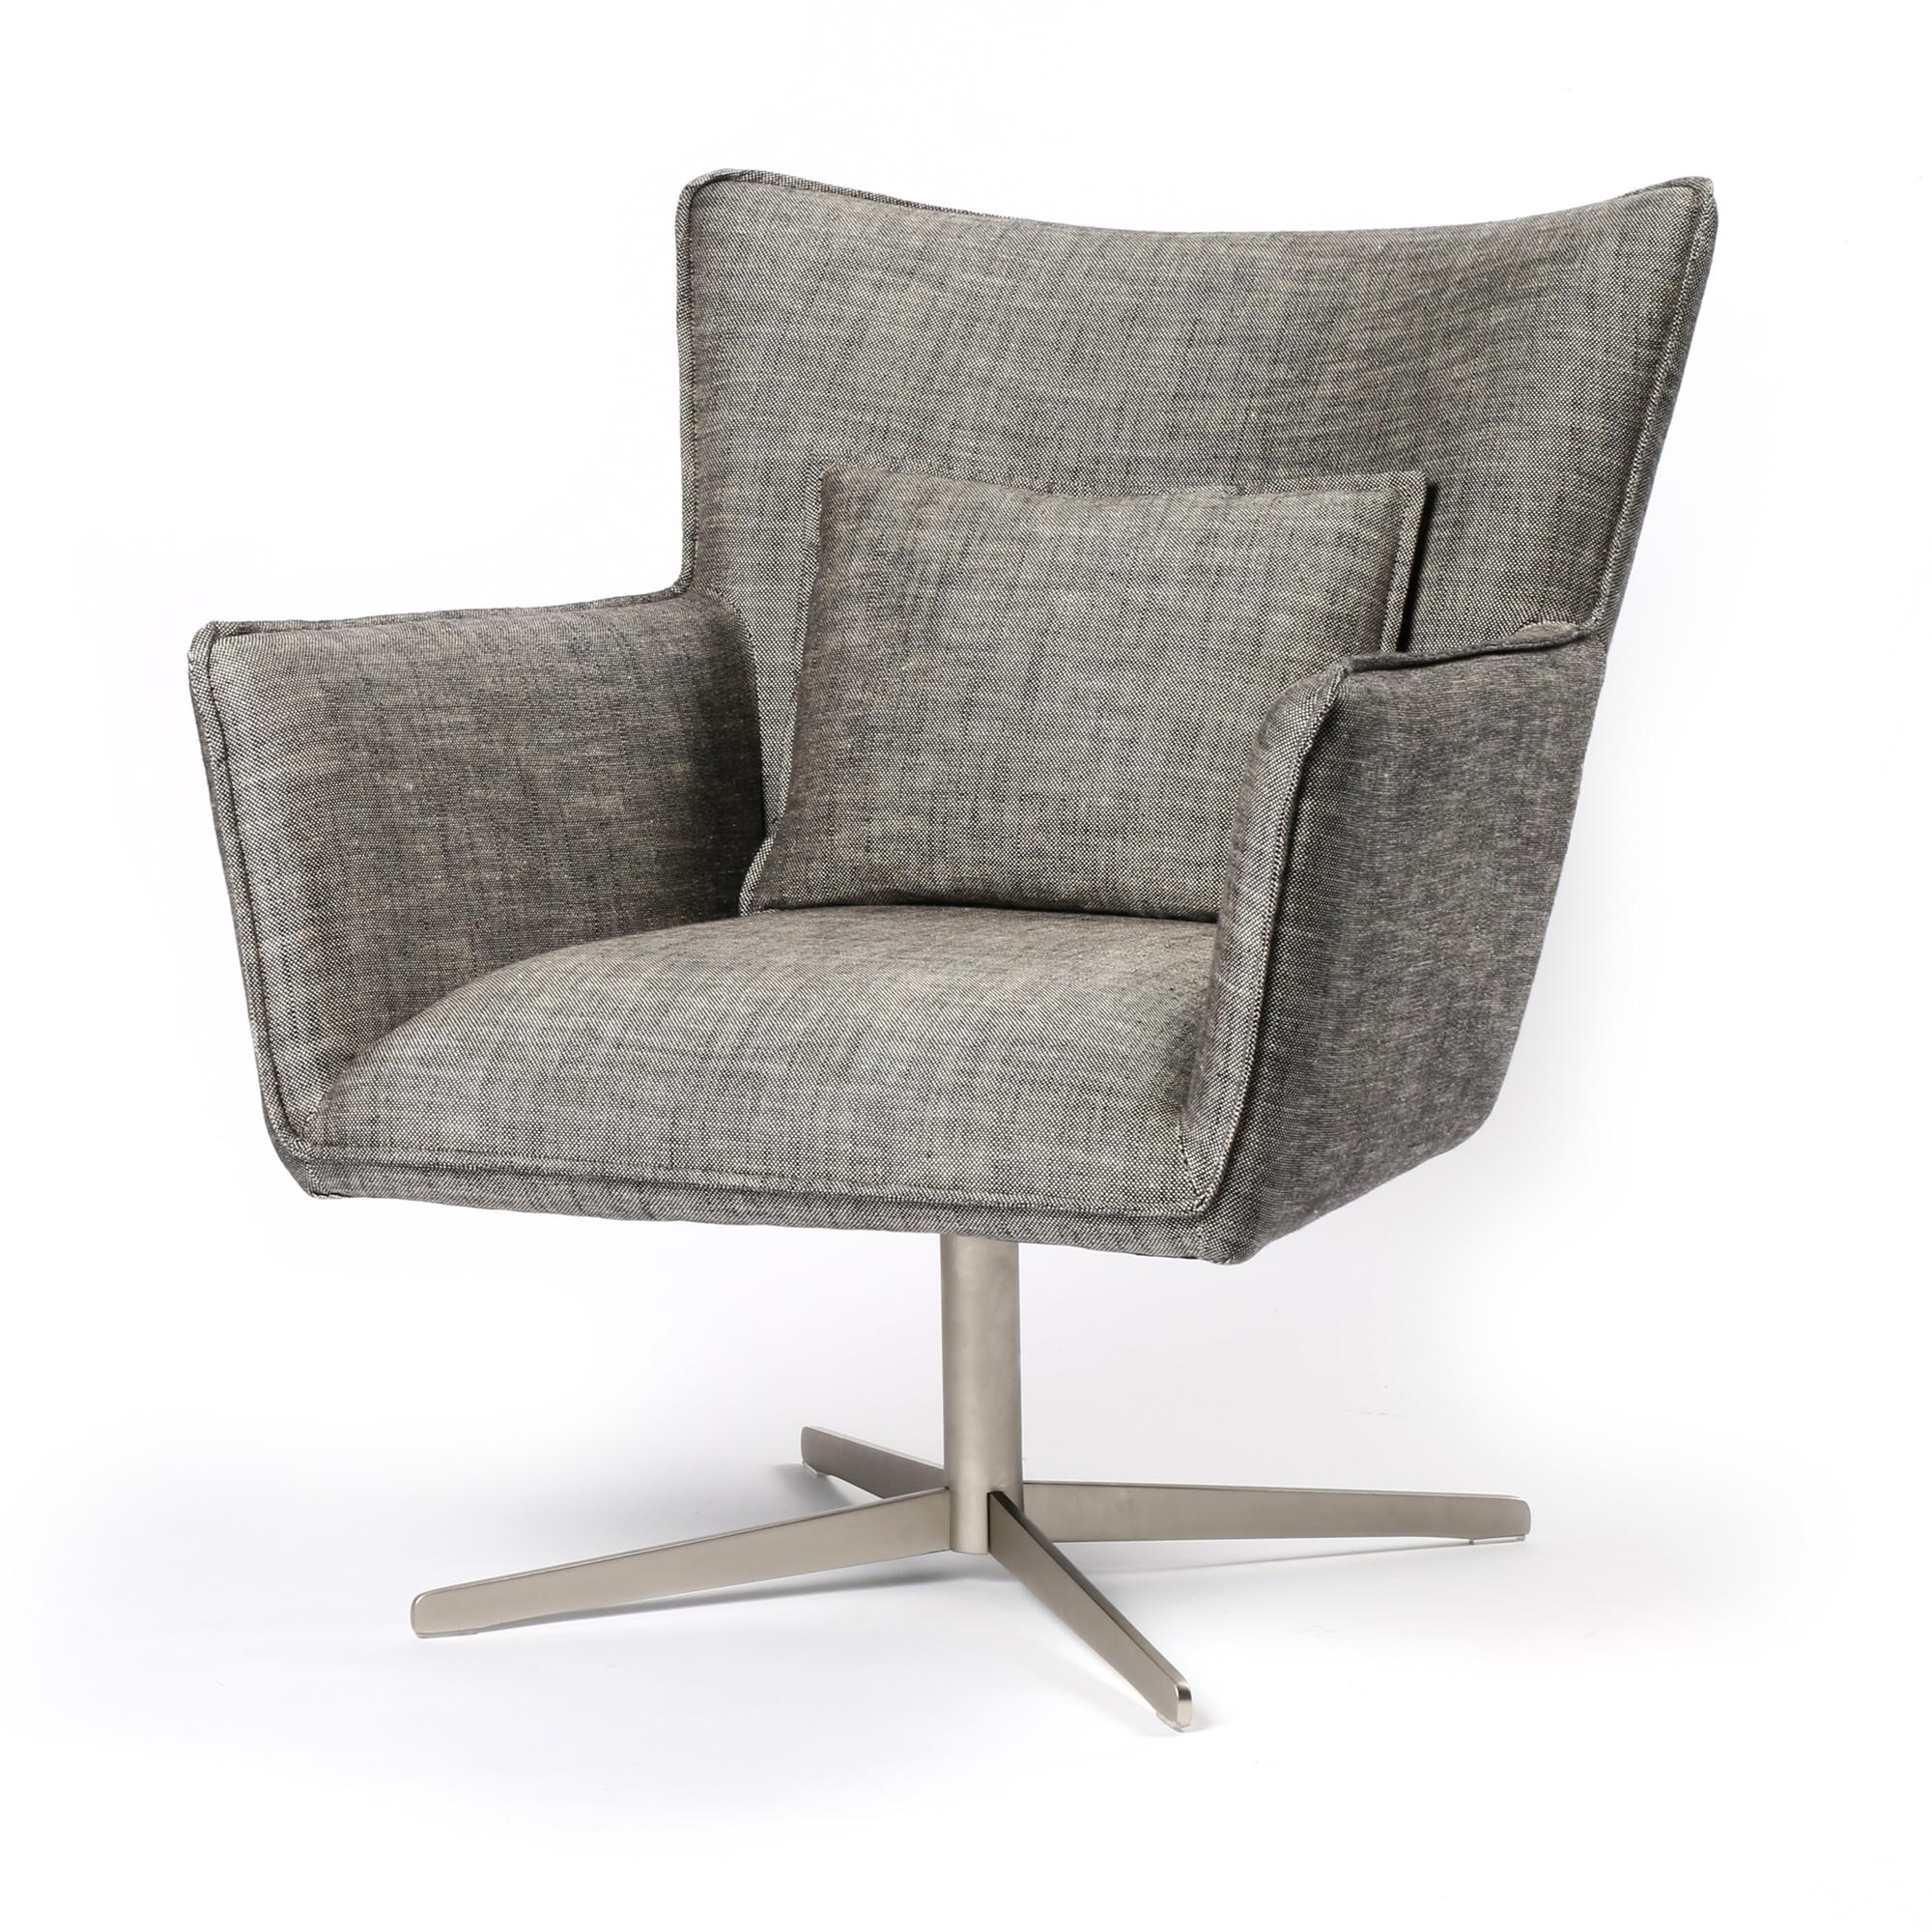 Jacob swivel chair in raven the khazana home austin furniture store